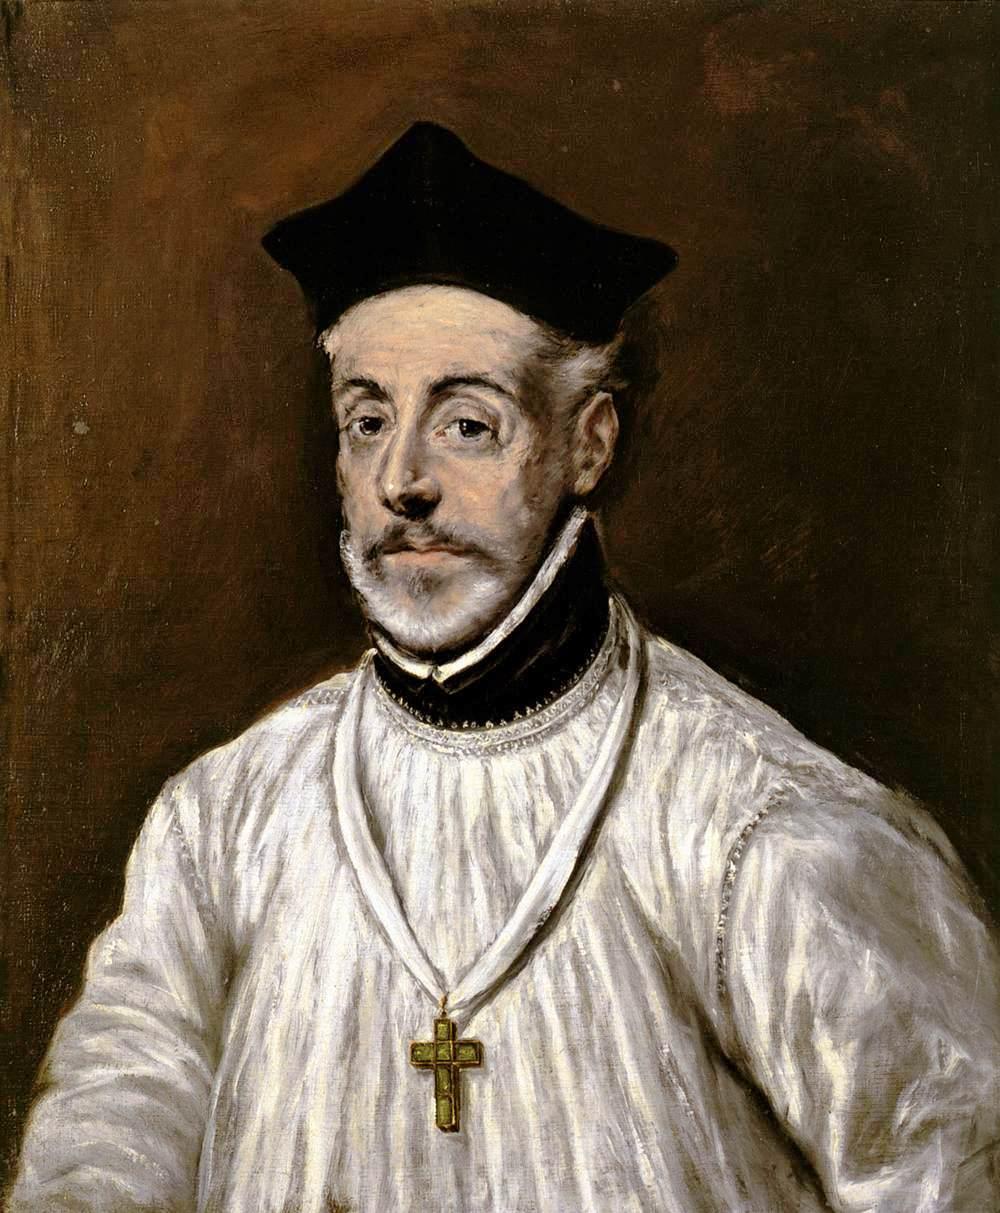 Stile Peplo Greco: Portrait Of Diego De Covarrubias